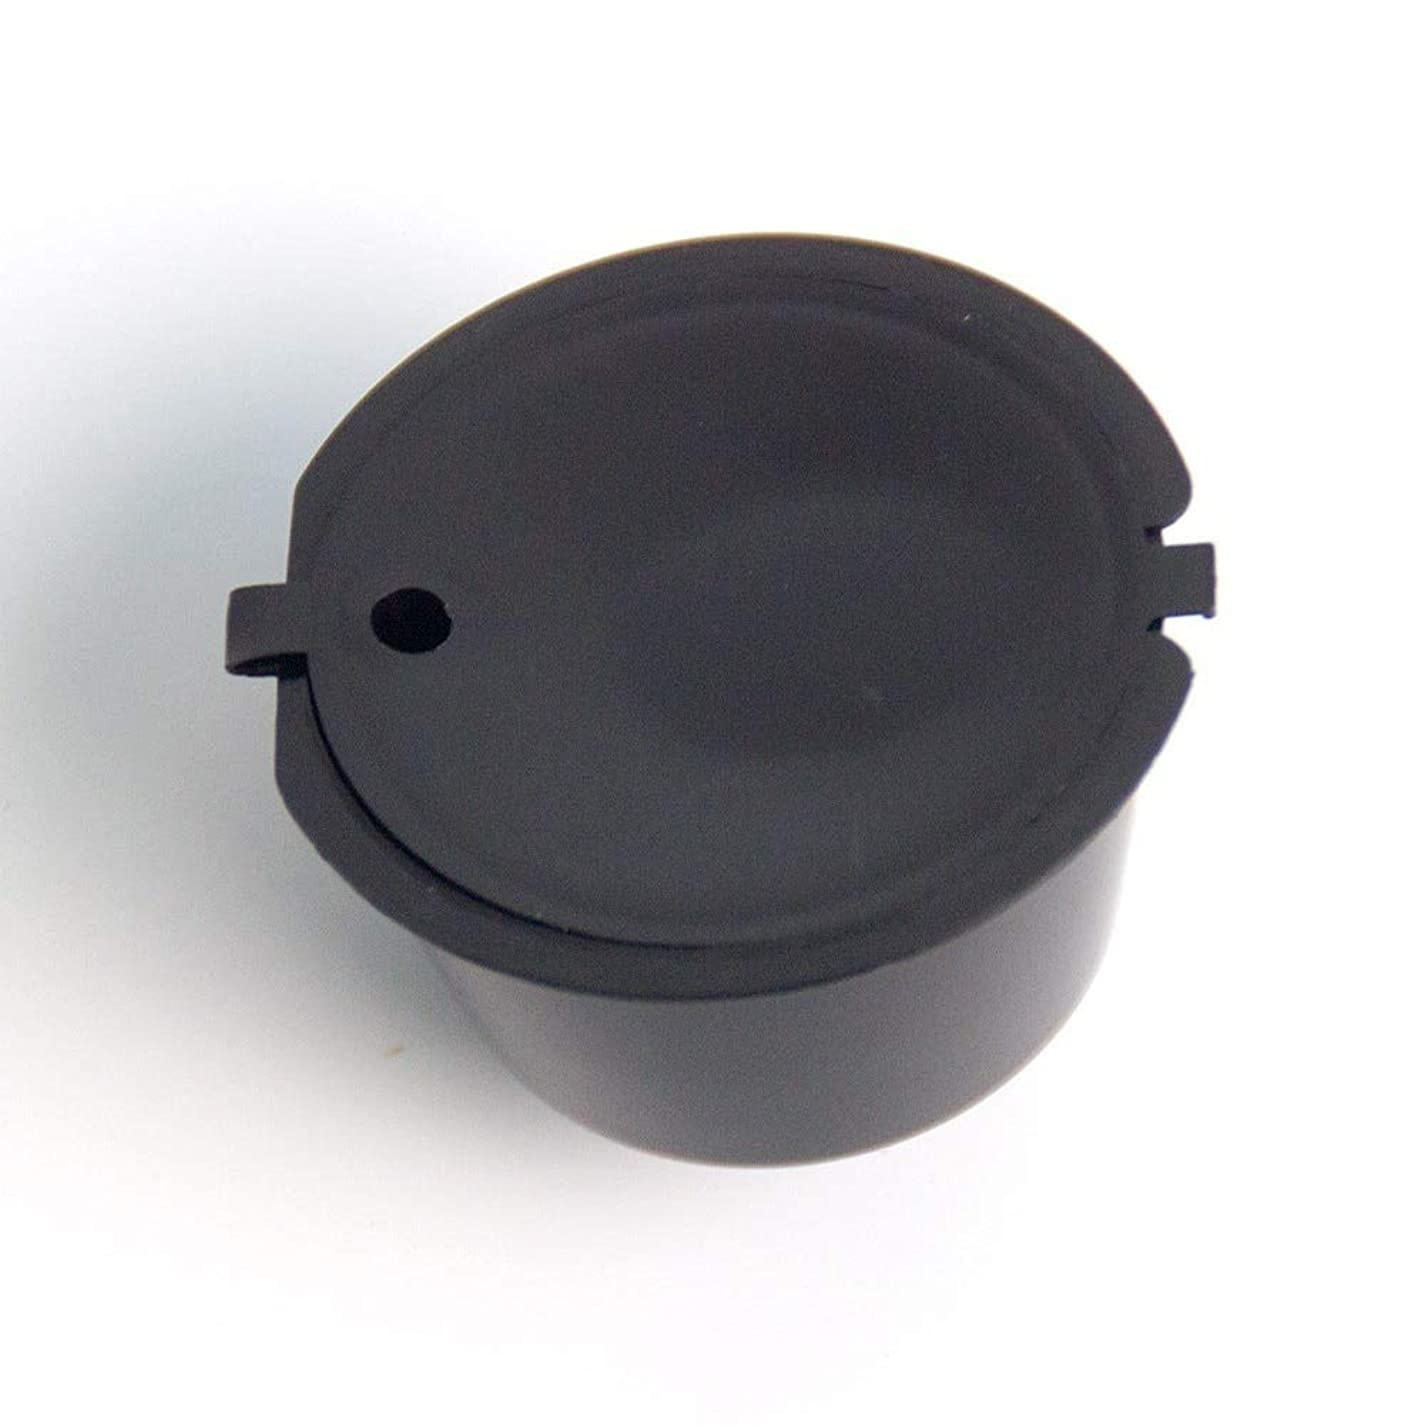 Maxcrestas - 1個11色プラスチック詰め替えコーヒーカプセルカップ200タイムズネスカフェドルチェグストフィルターバスケットのカプセルのための再利用可能な互換性